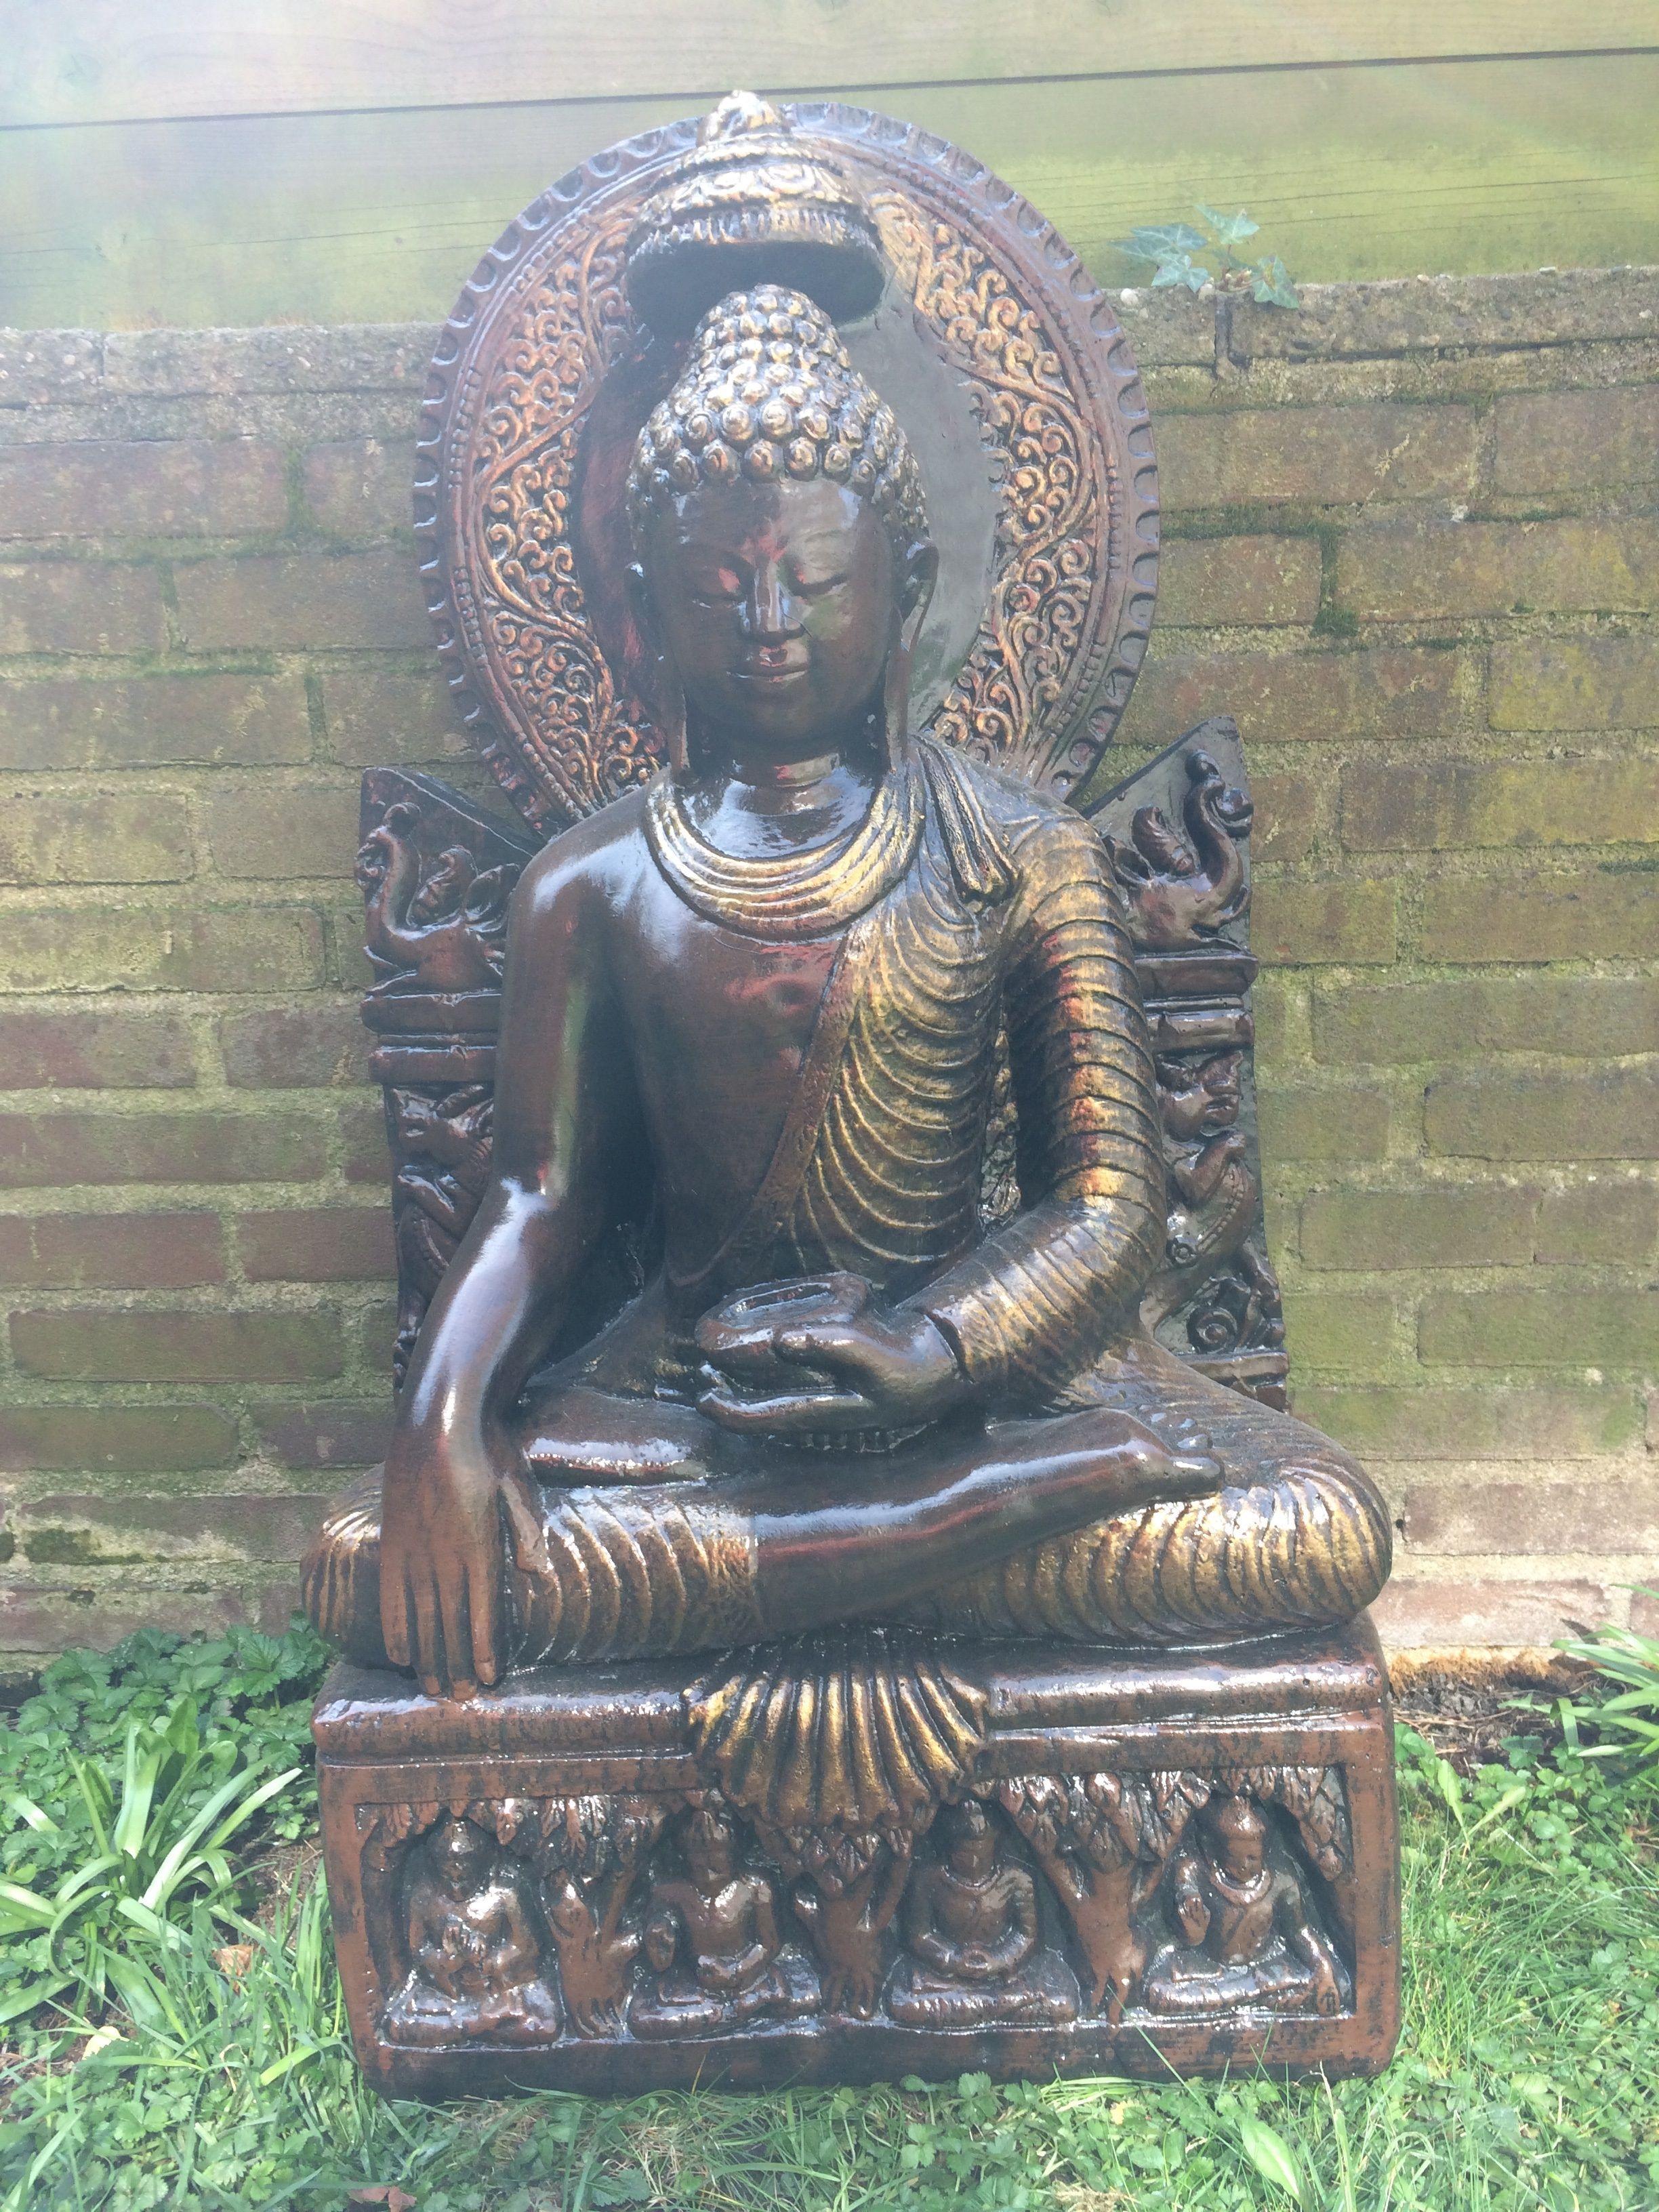 Boeddha Beelden Voor De Tuin.Boeddha Thaise Boeddha Beelden Thais Stenen Beelden Tuinbeelden